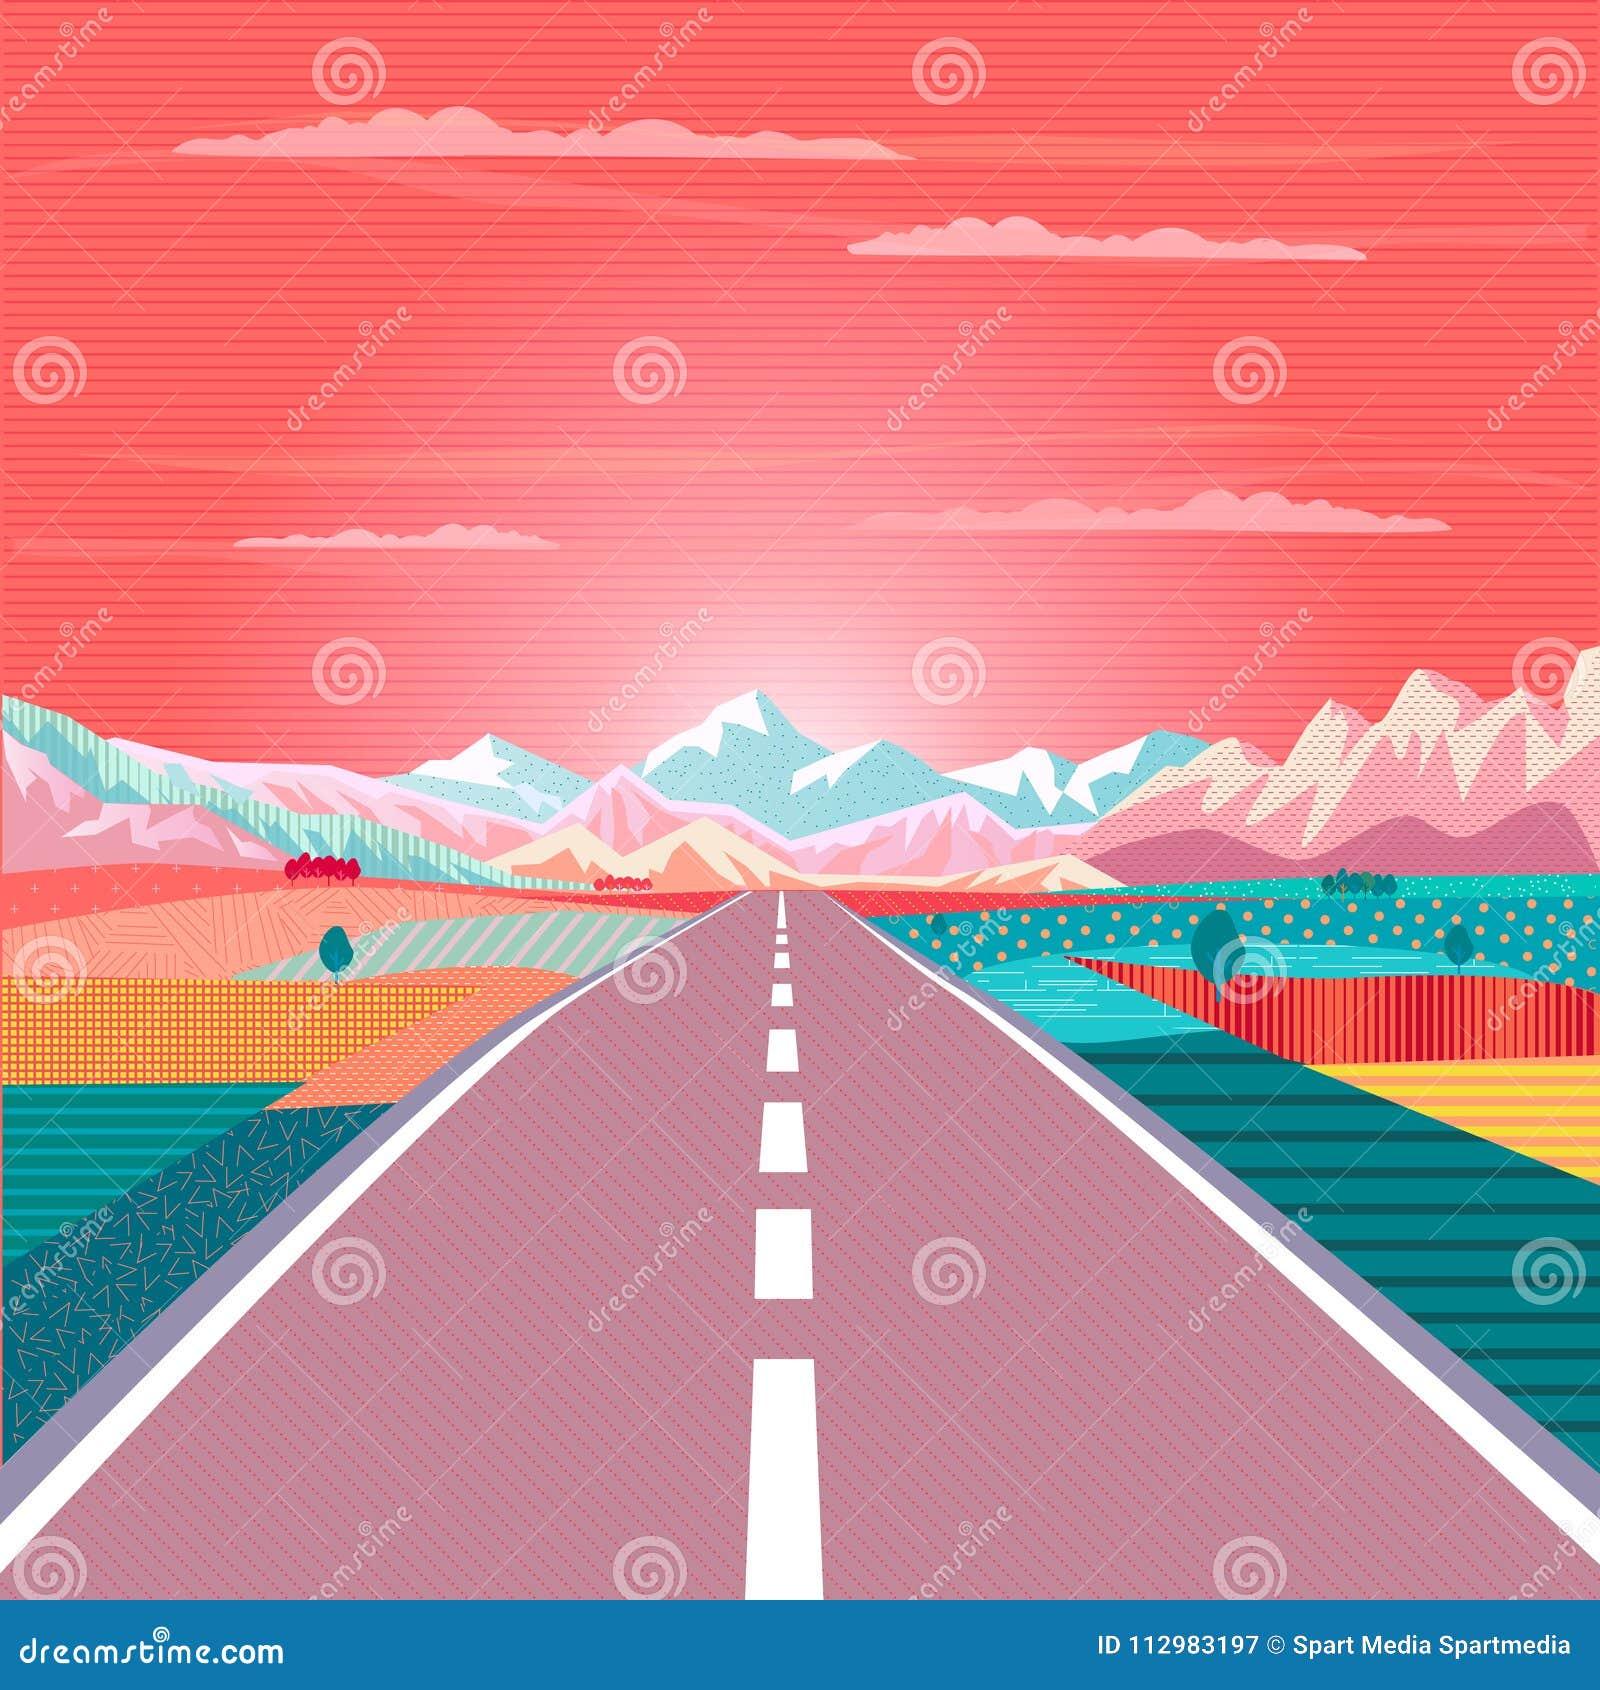 Road trip Rocky Mountain Sunset Summer travel adventure